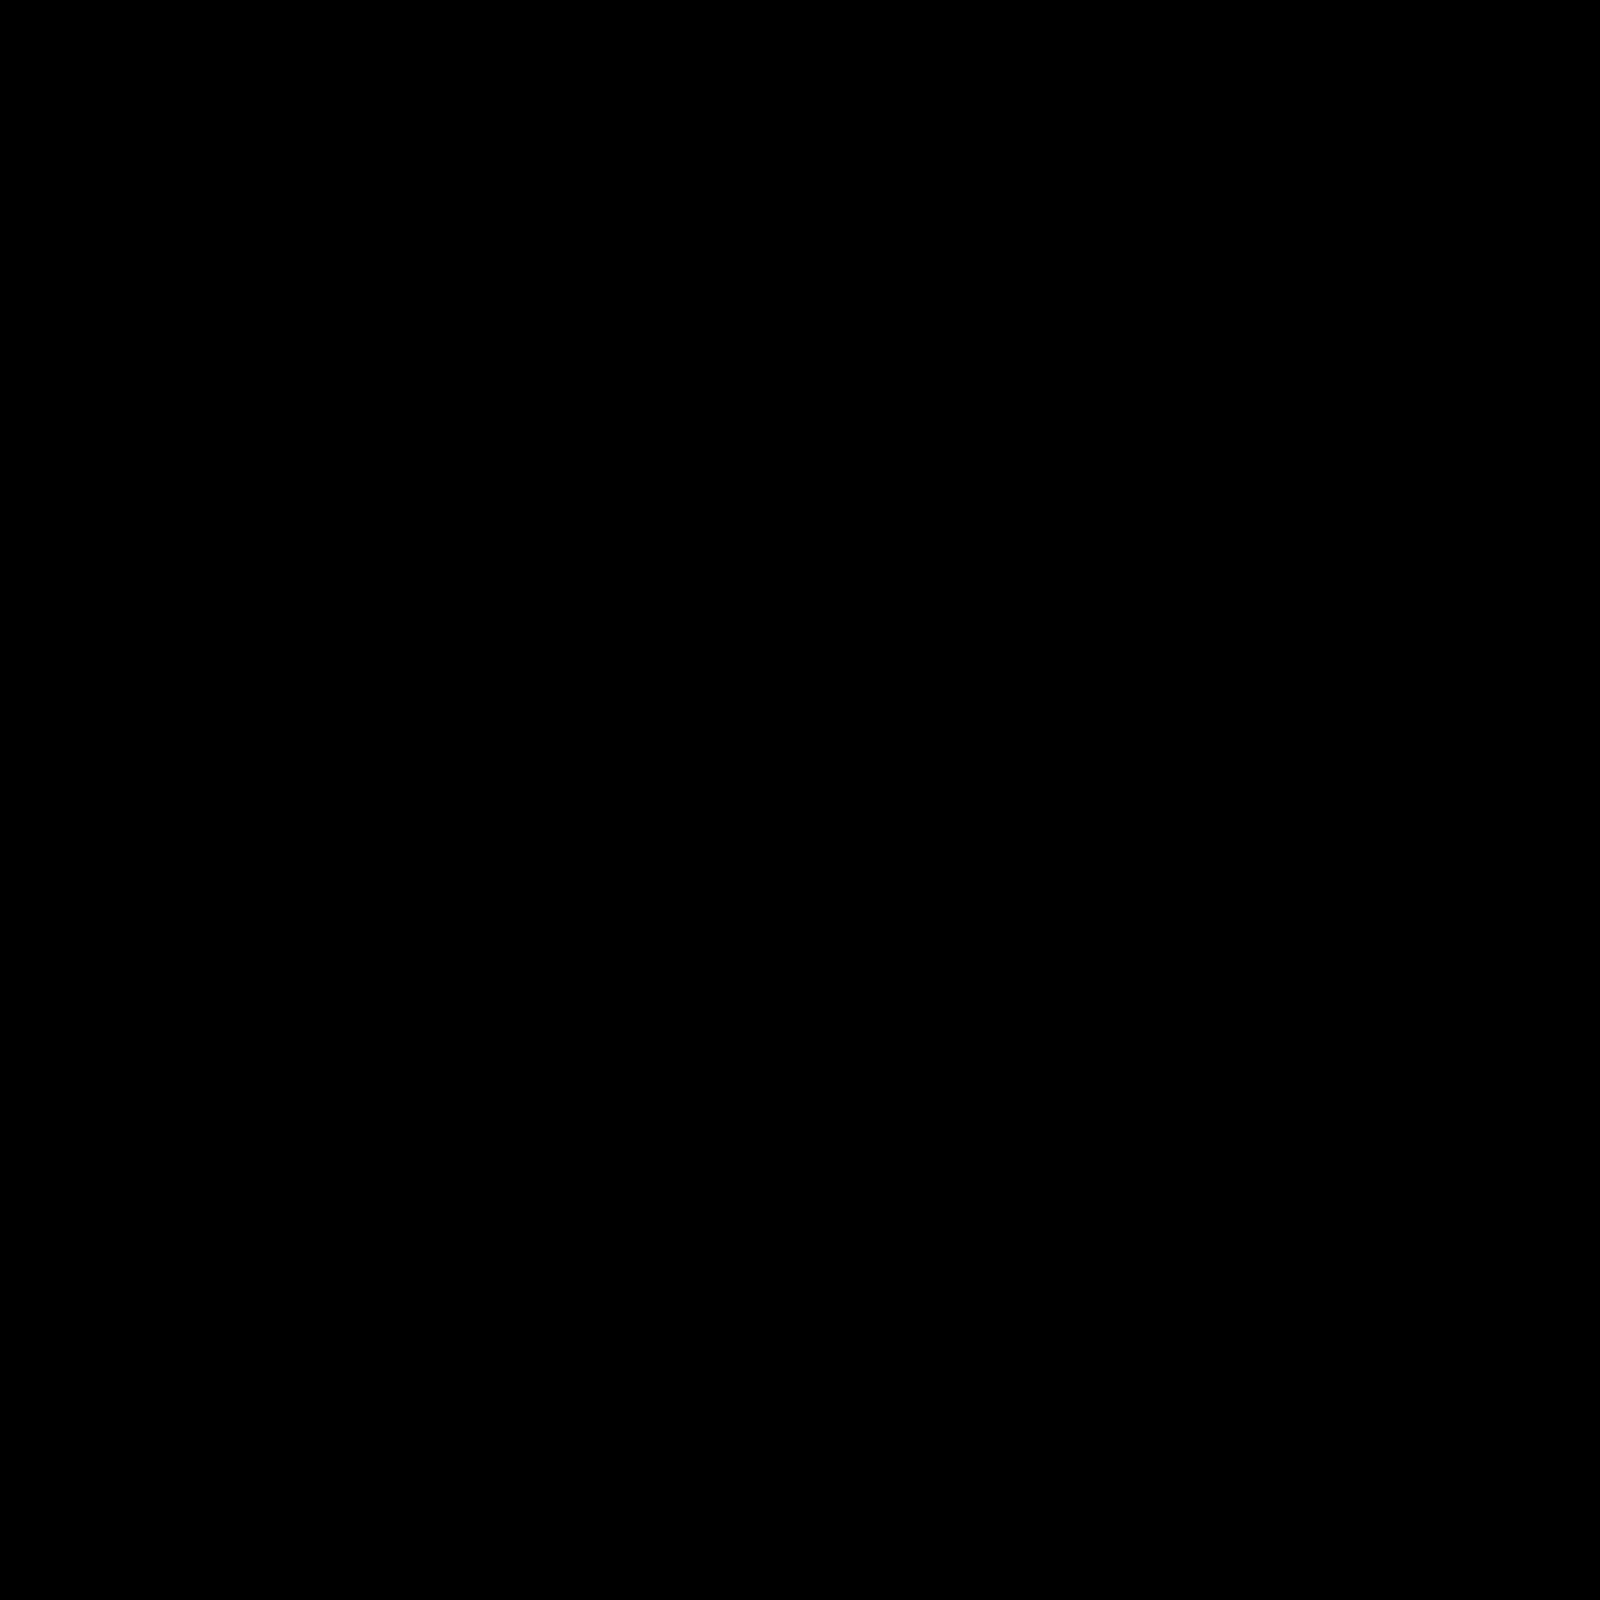 Backspace Filled icon